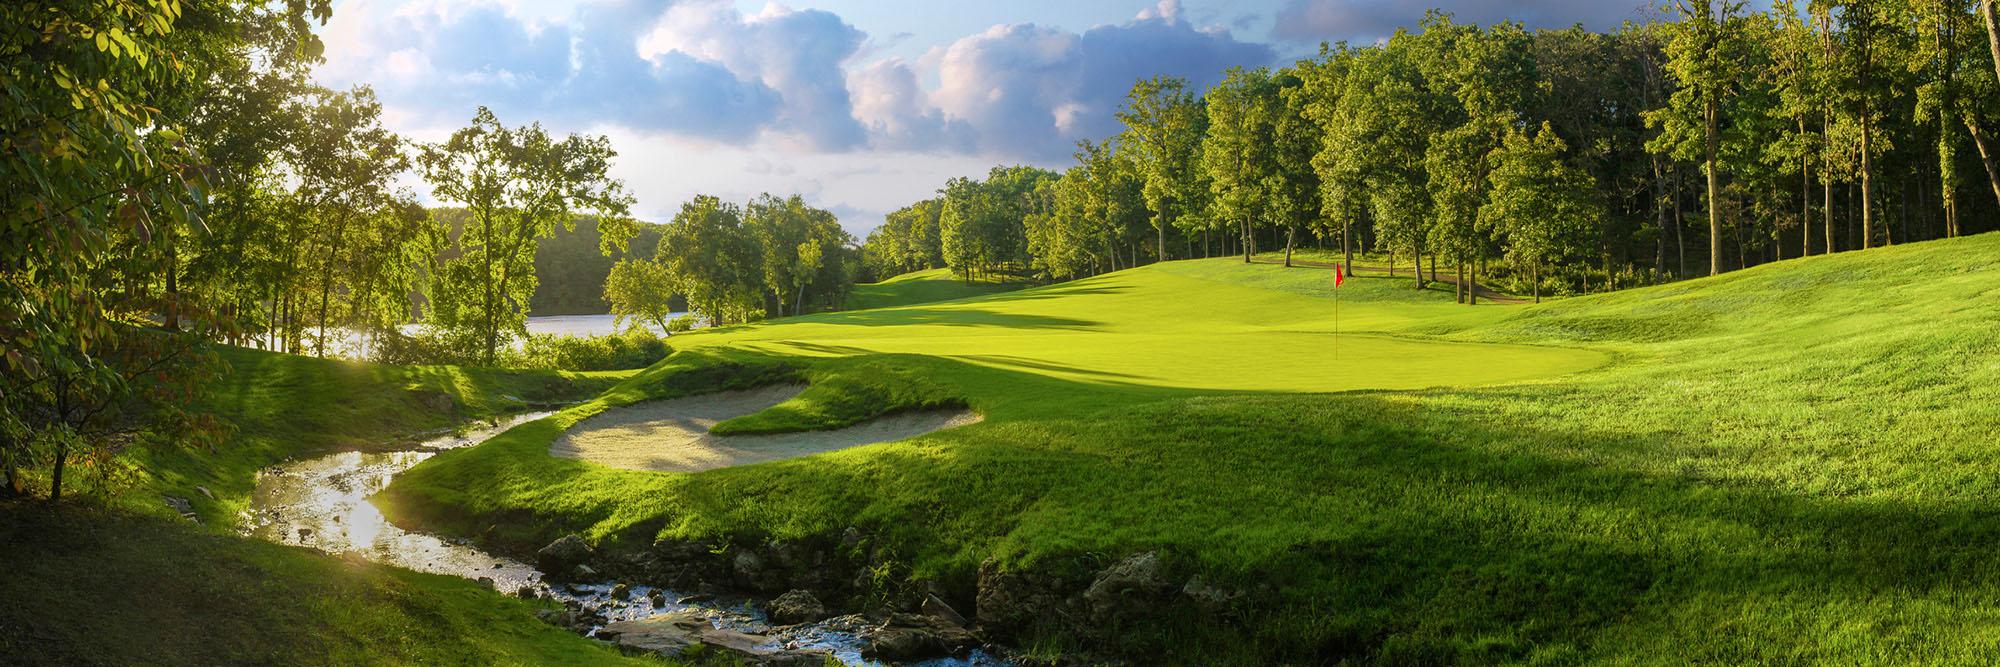 Golf Course Image - The Club at Porto Cima No. 7